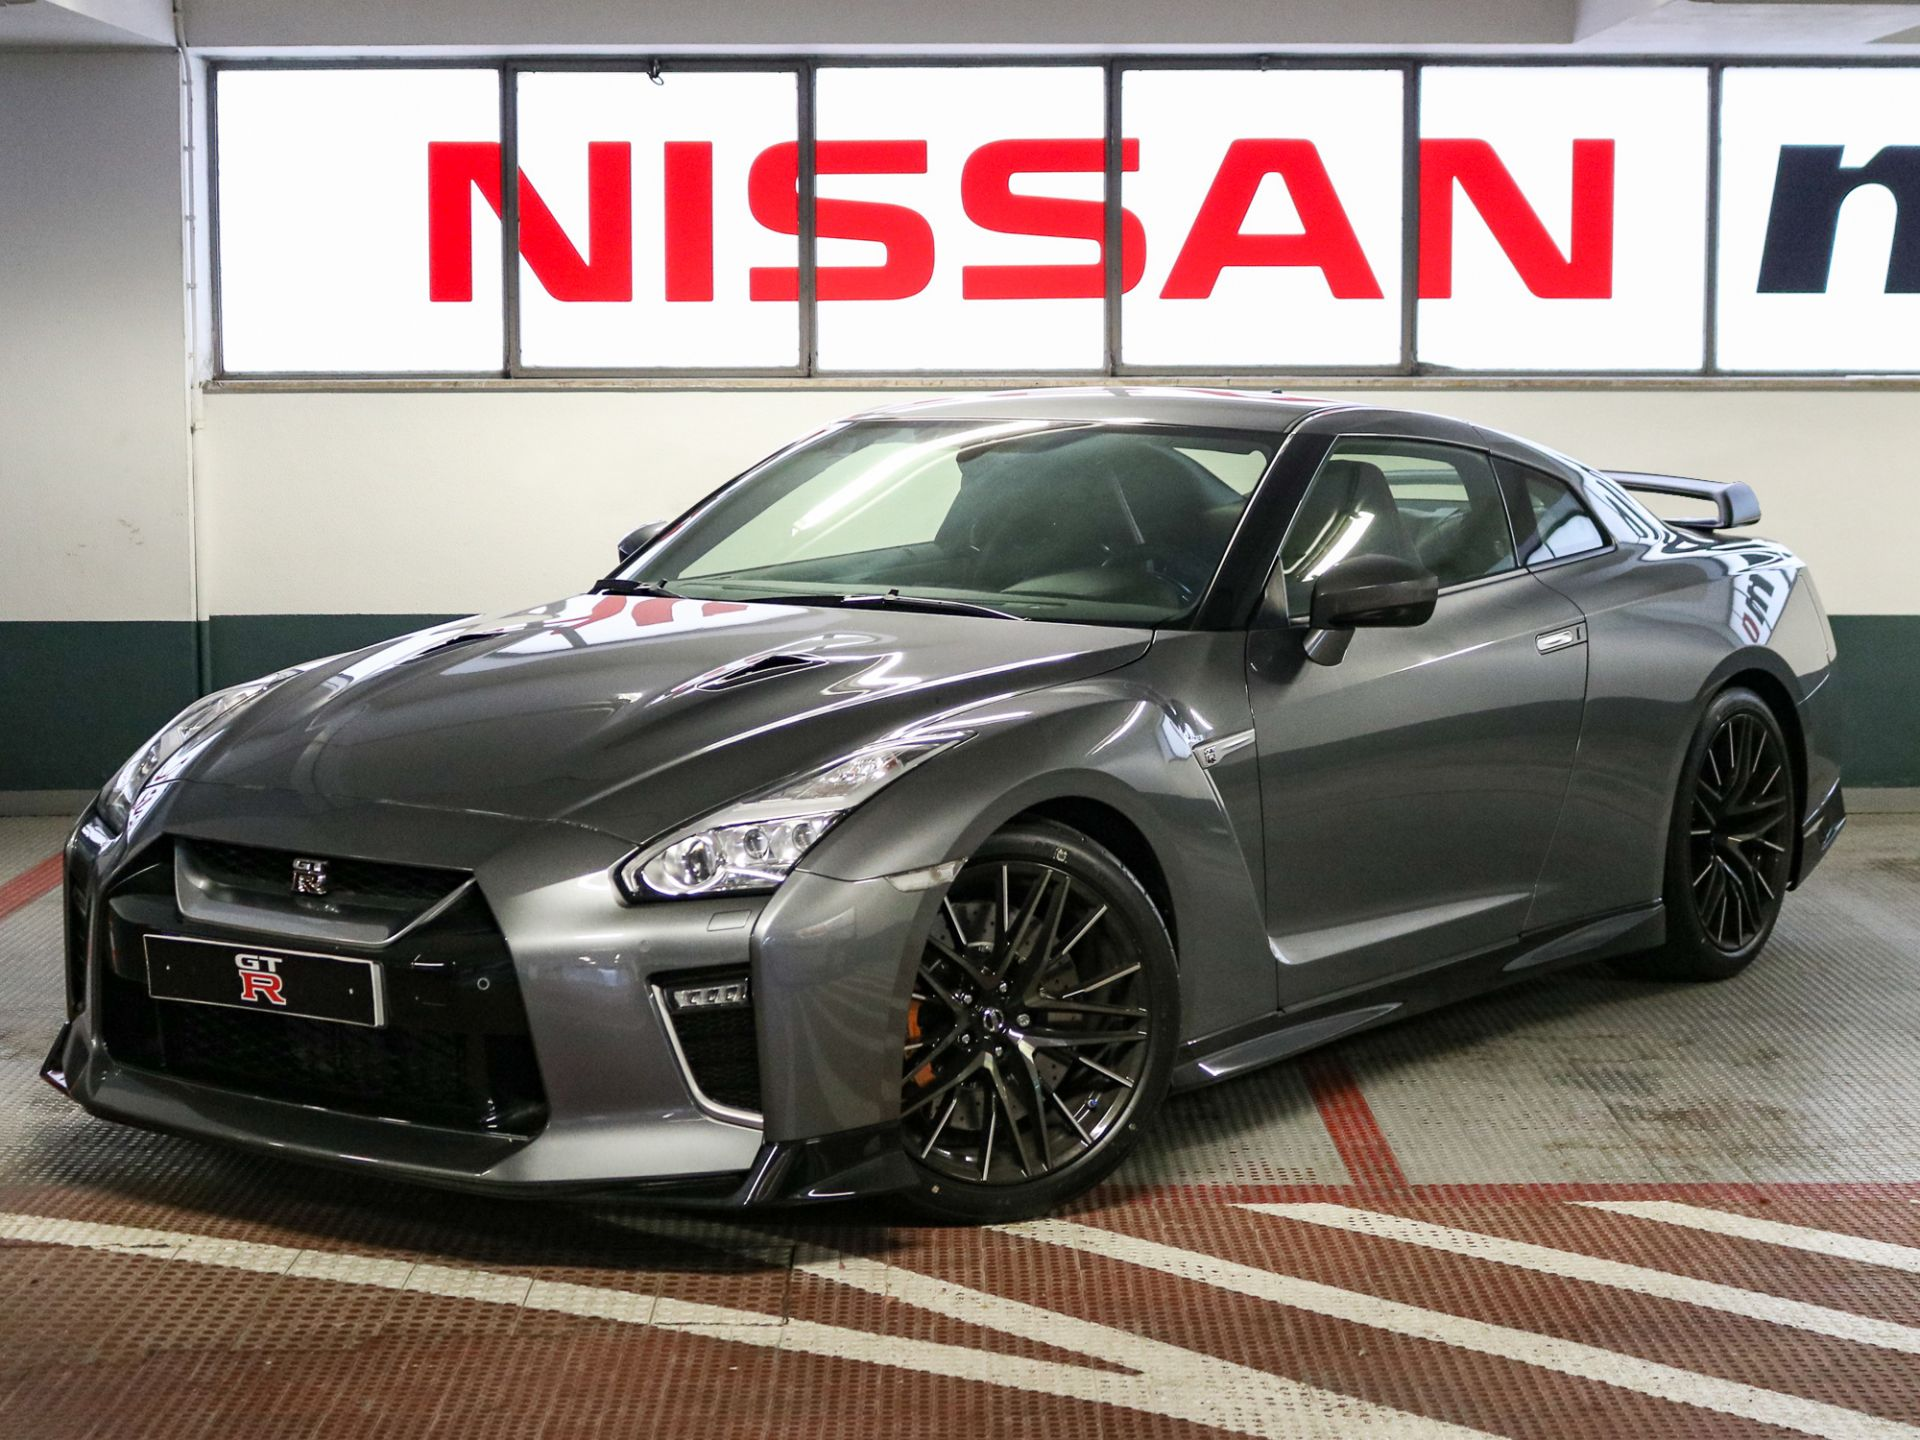 Nissan GT-R 2p 3.8G V6 570 CV Black Edition usada Lisboa